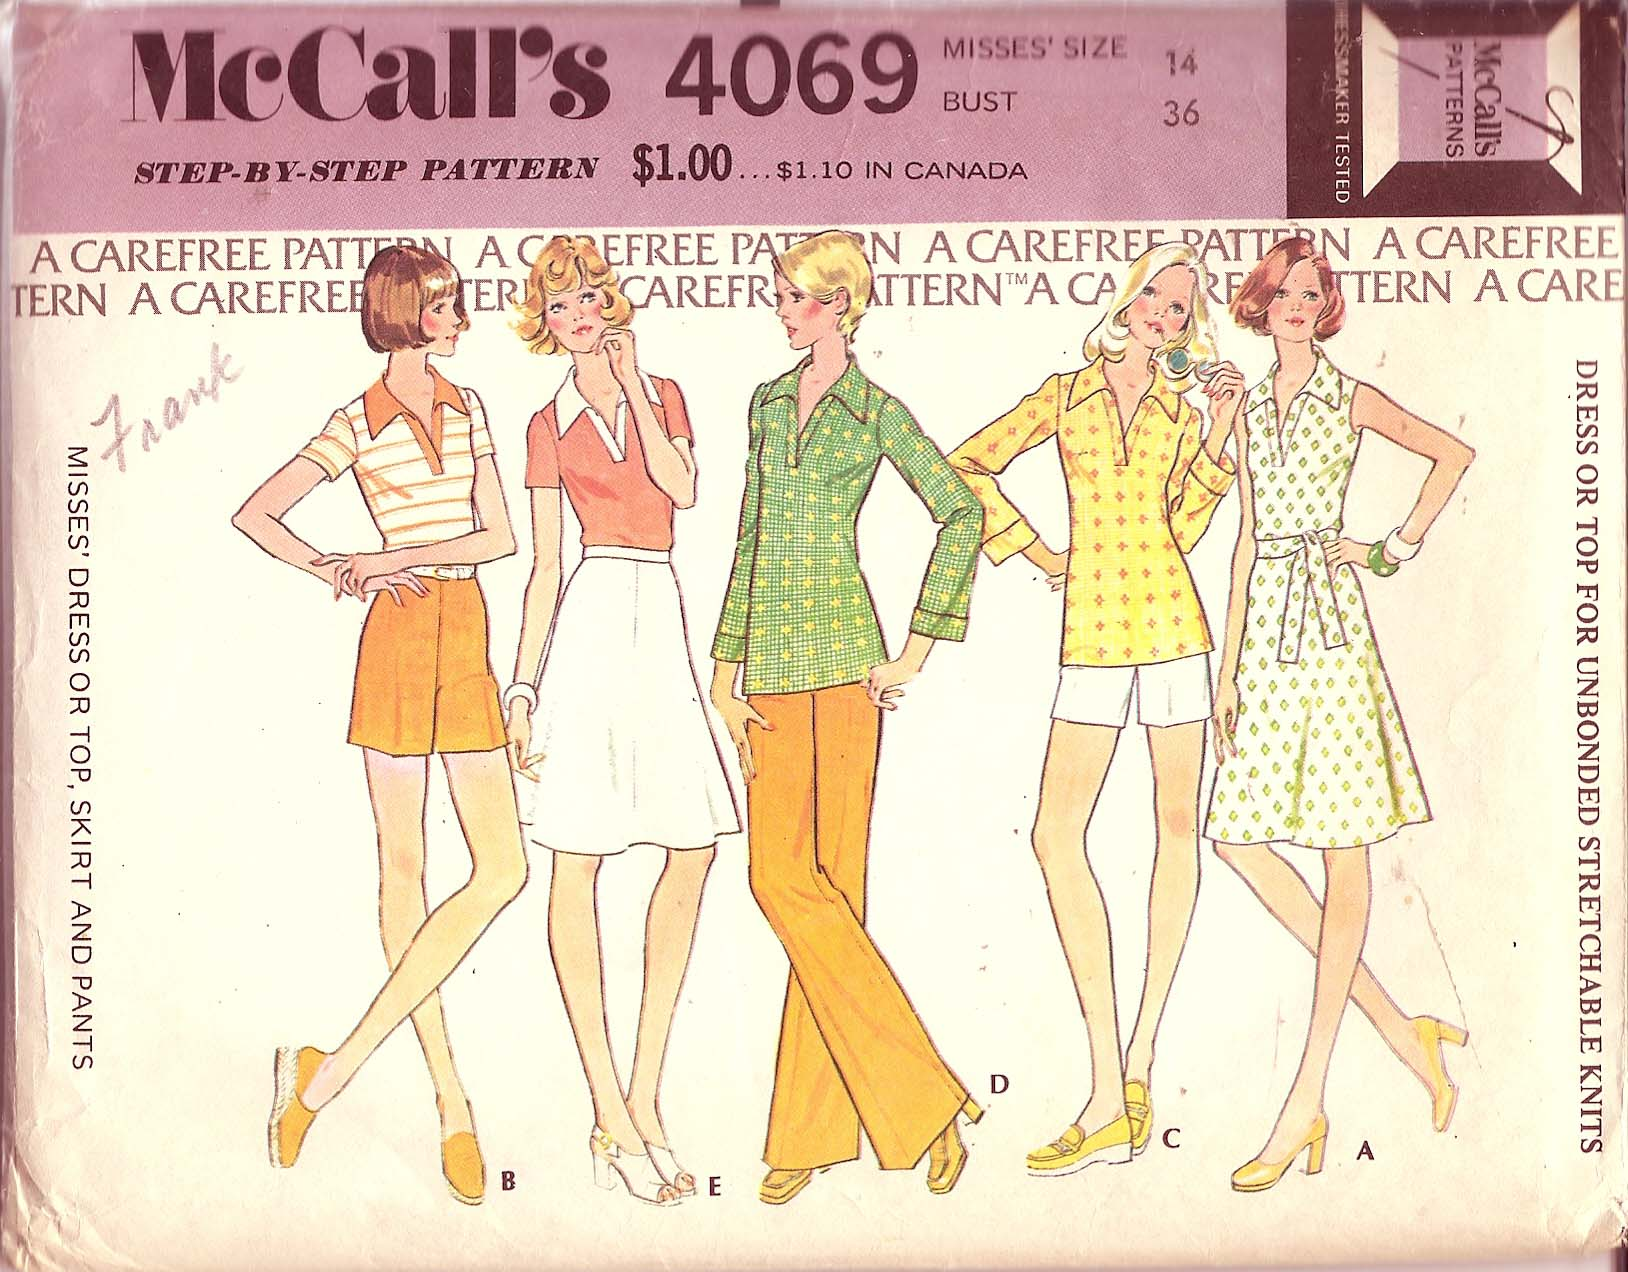 McCall's 4069 A